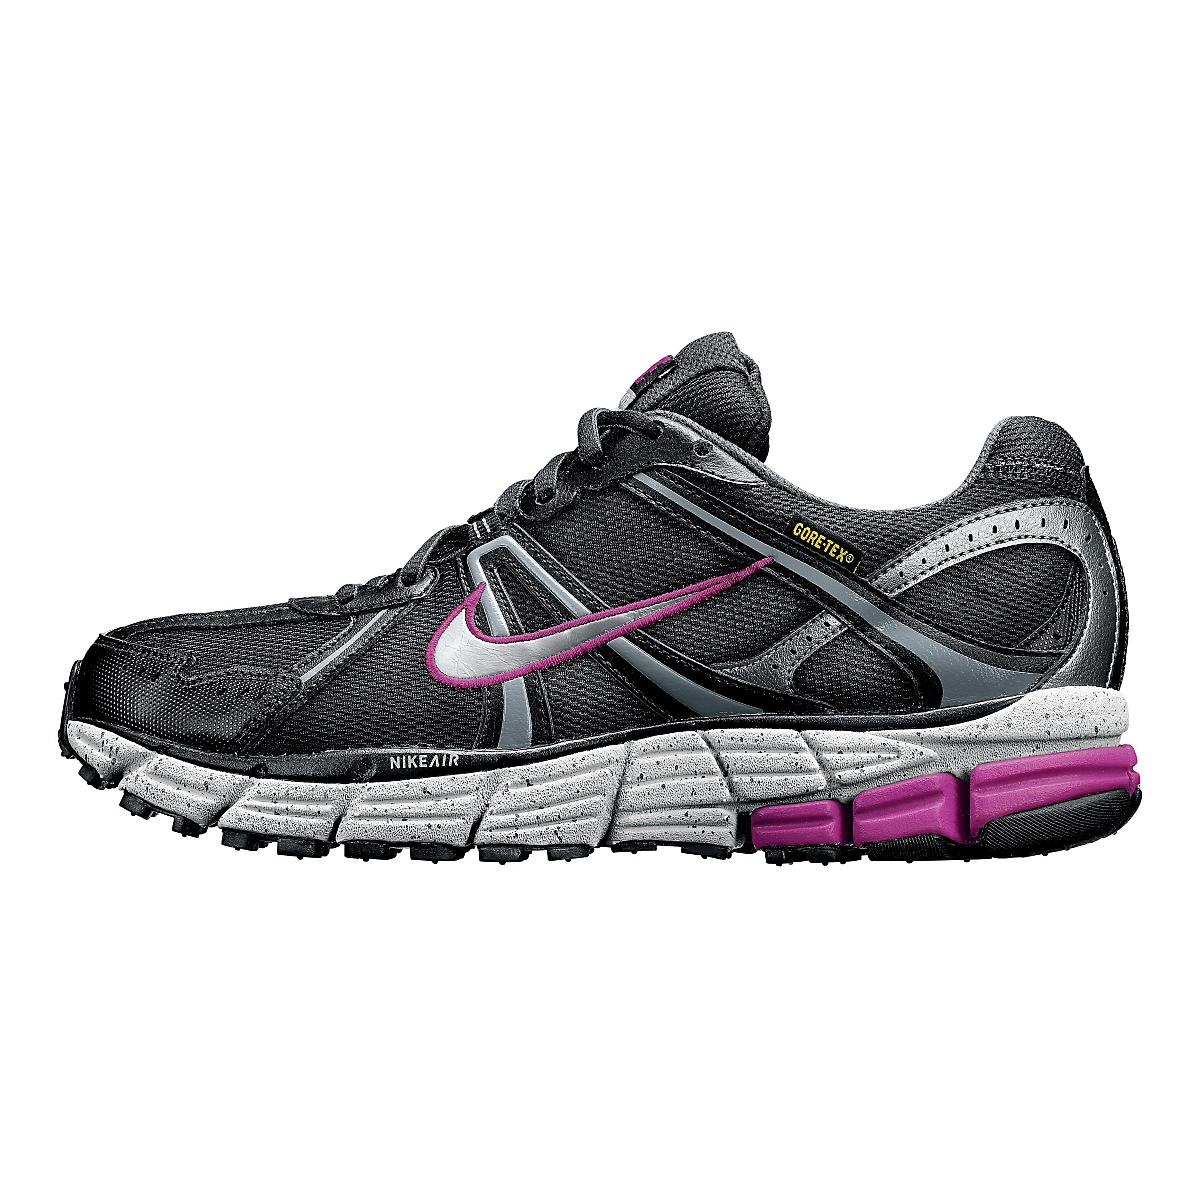 b6ff2661094f Womens Nike Air Pegasus+ 26 GTX Running Shoe at Road Runner Sports